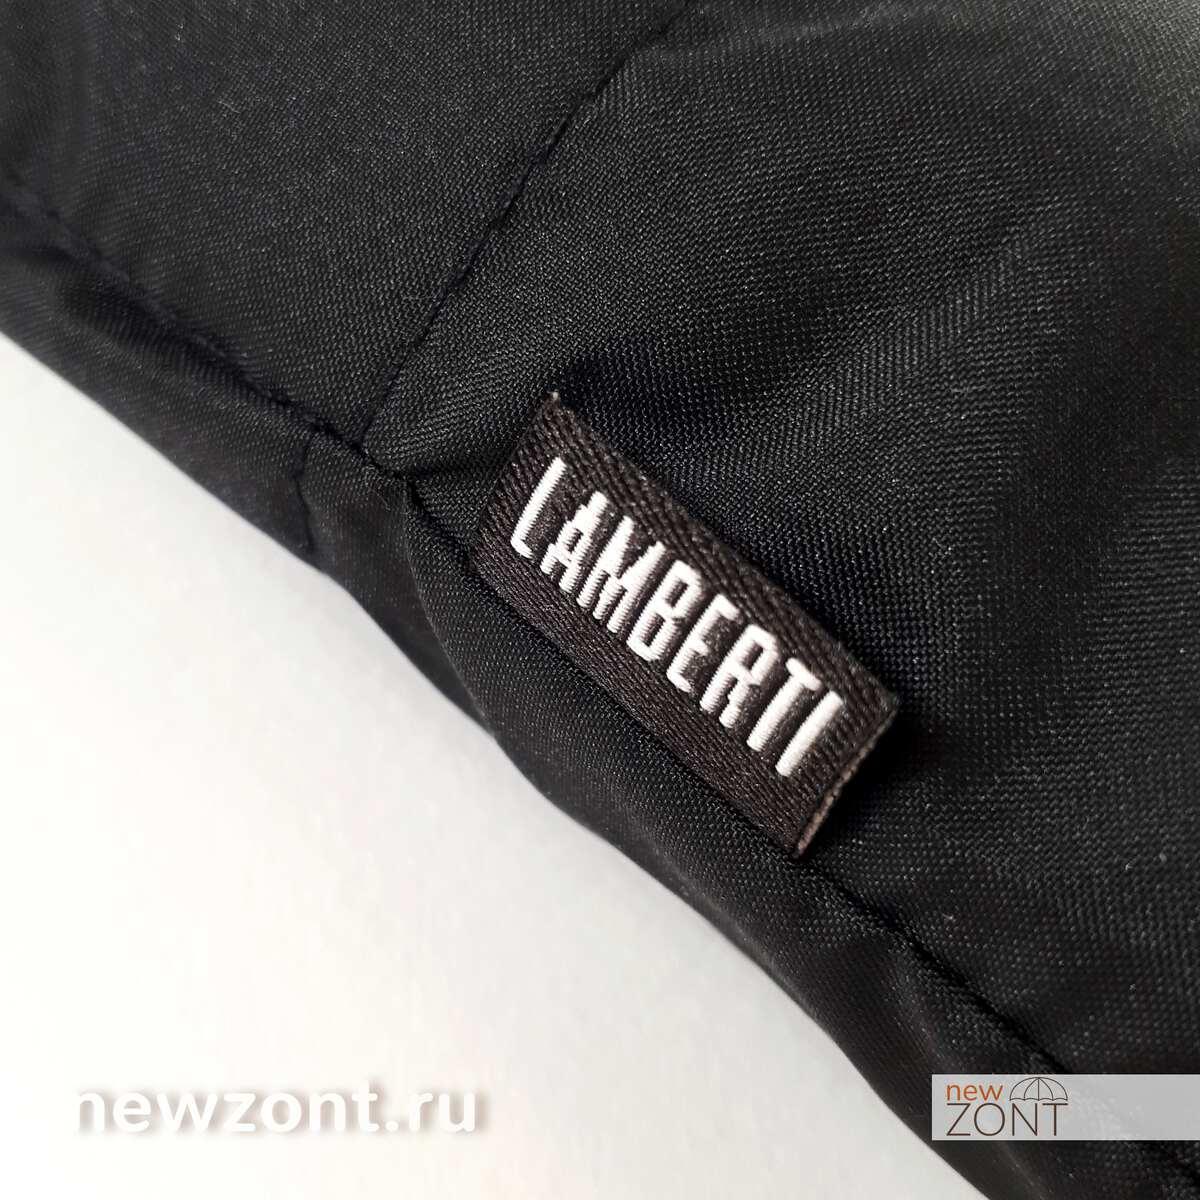 Бренд LAMBERTI логотип